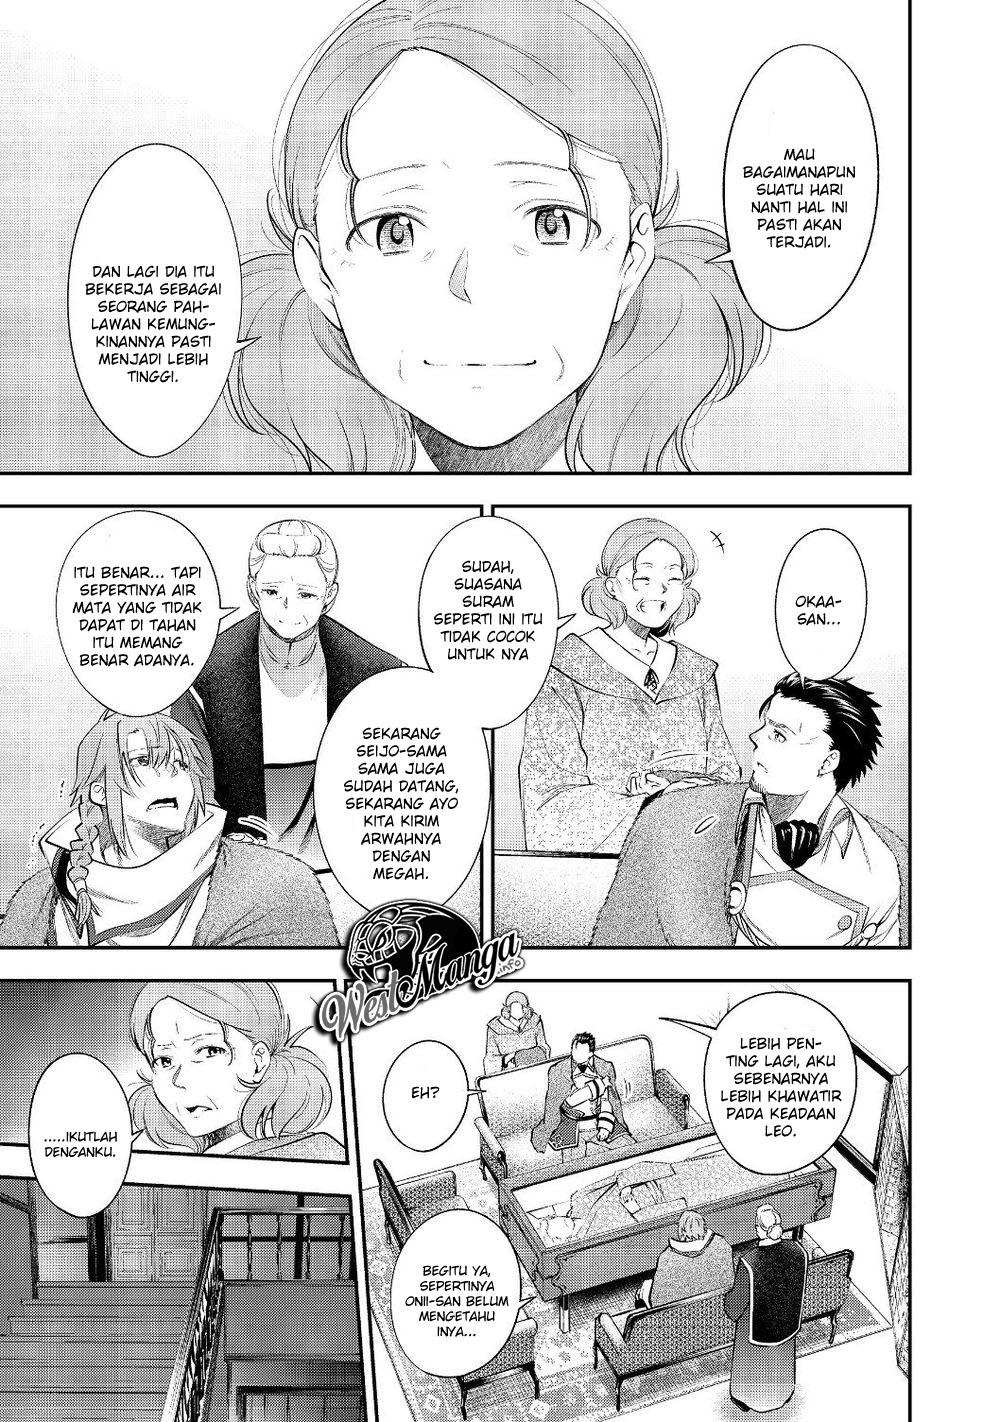 Keizoku wa Maryoku Nari: Chapter 10.1 - Page 4